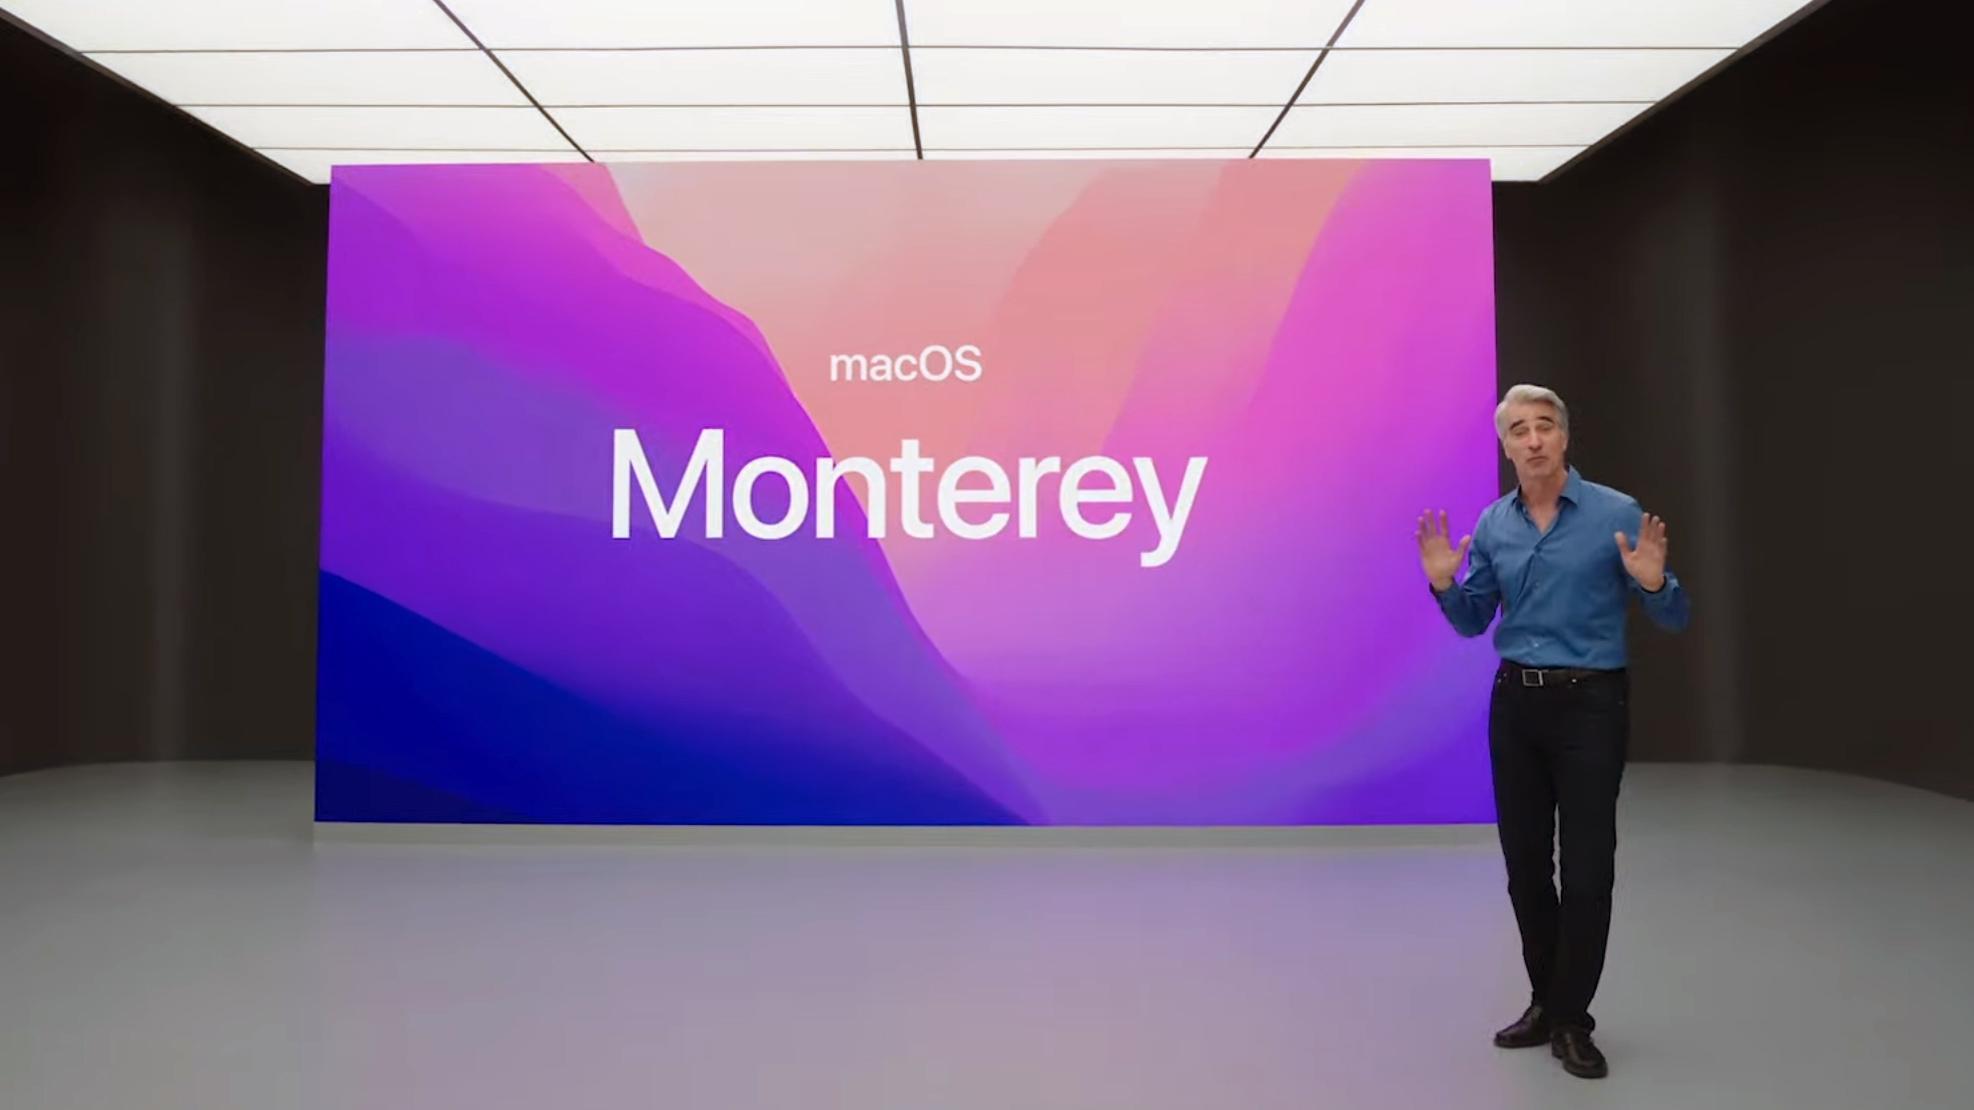 Apples Craig Federighi viser frem nye MacOS Monterey under årets utviklerkonferanse, WWDC.